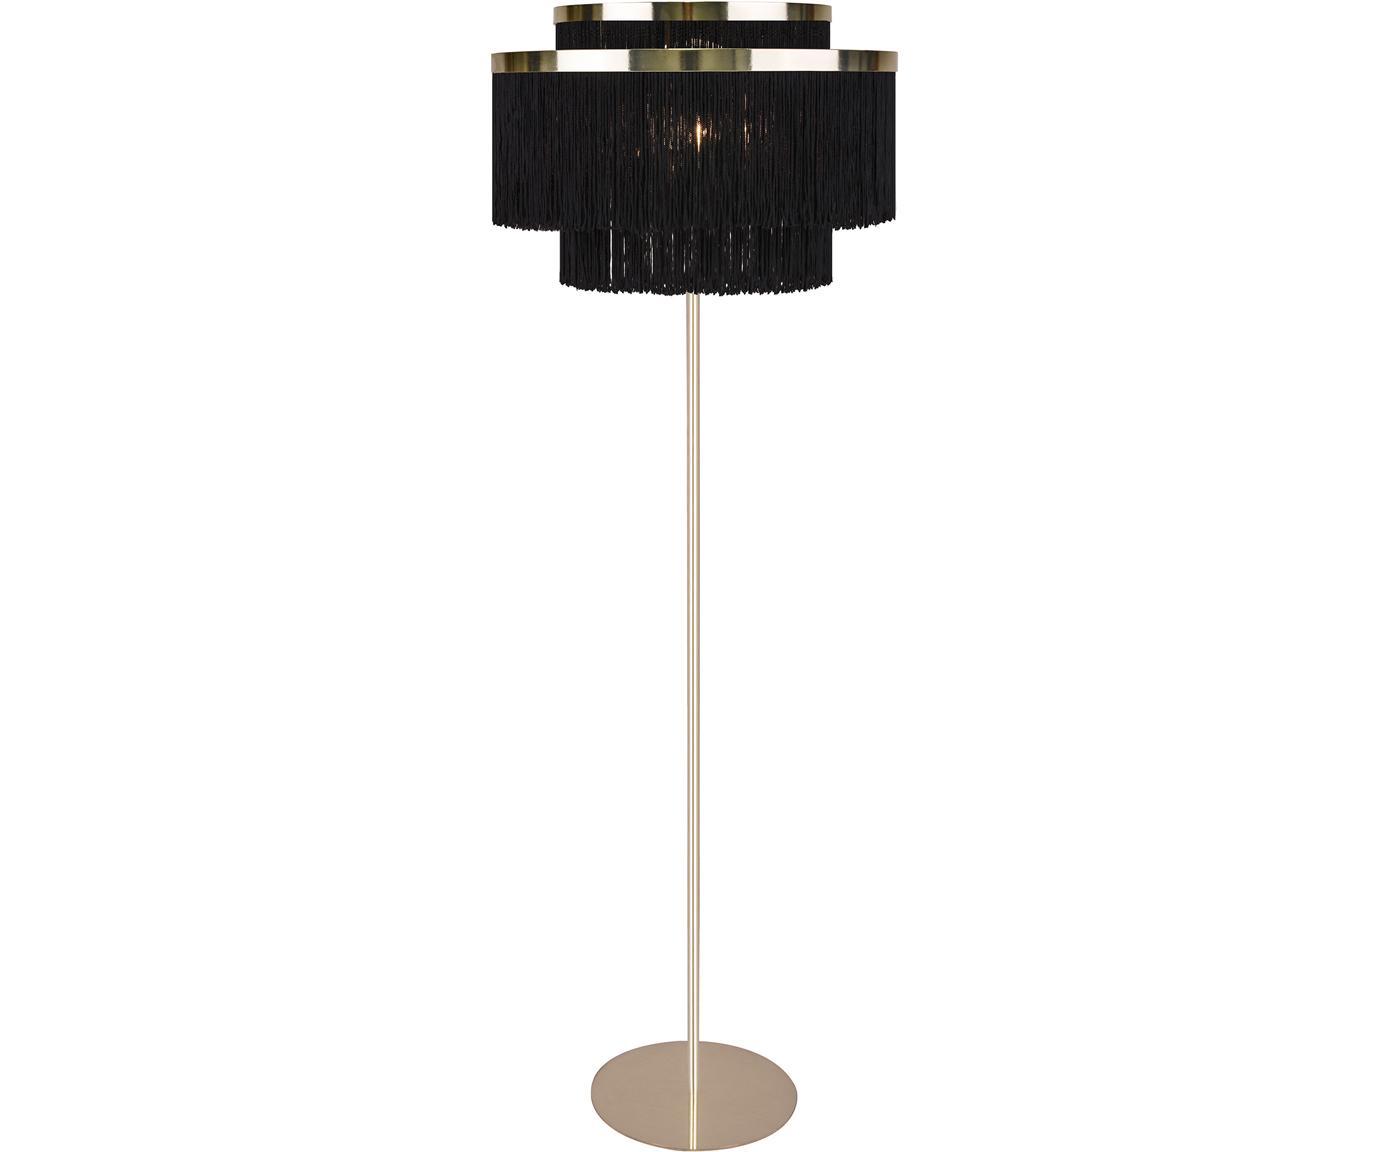 Lampada da terra Frans, Tessuto, metallo, Nero, dorato, Ø 52 x Alt. 158 cm